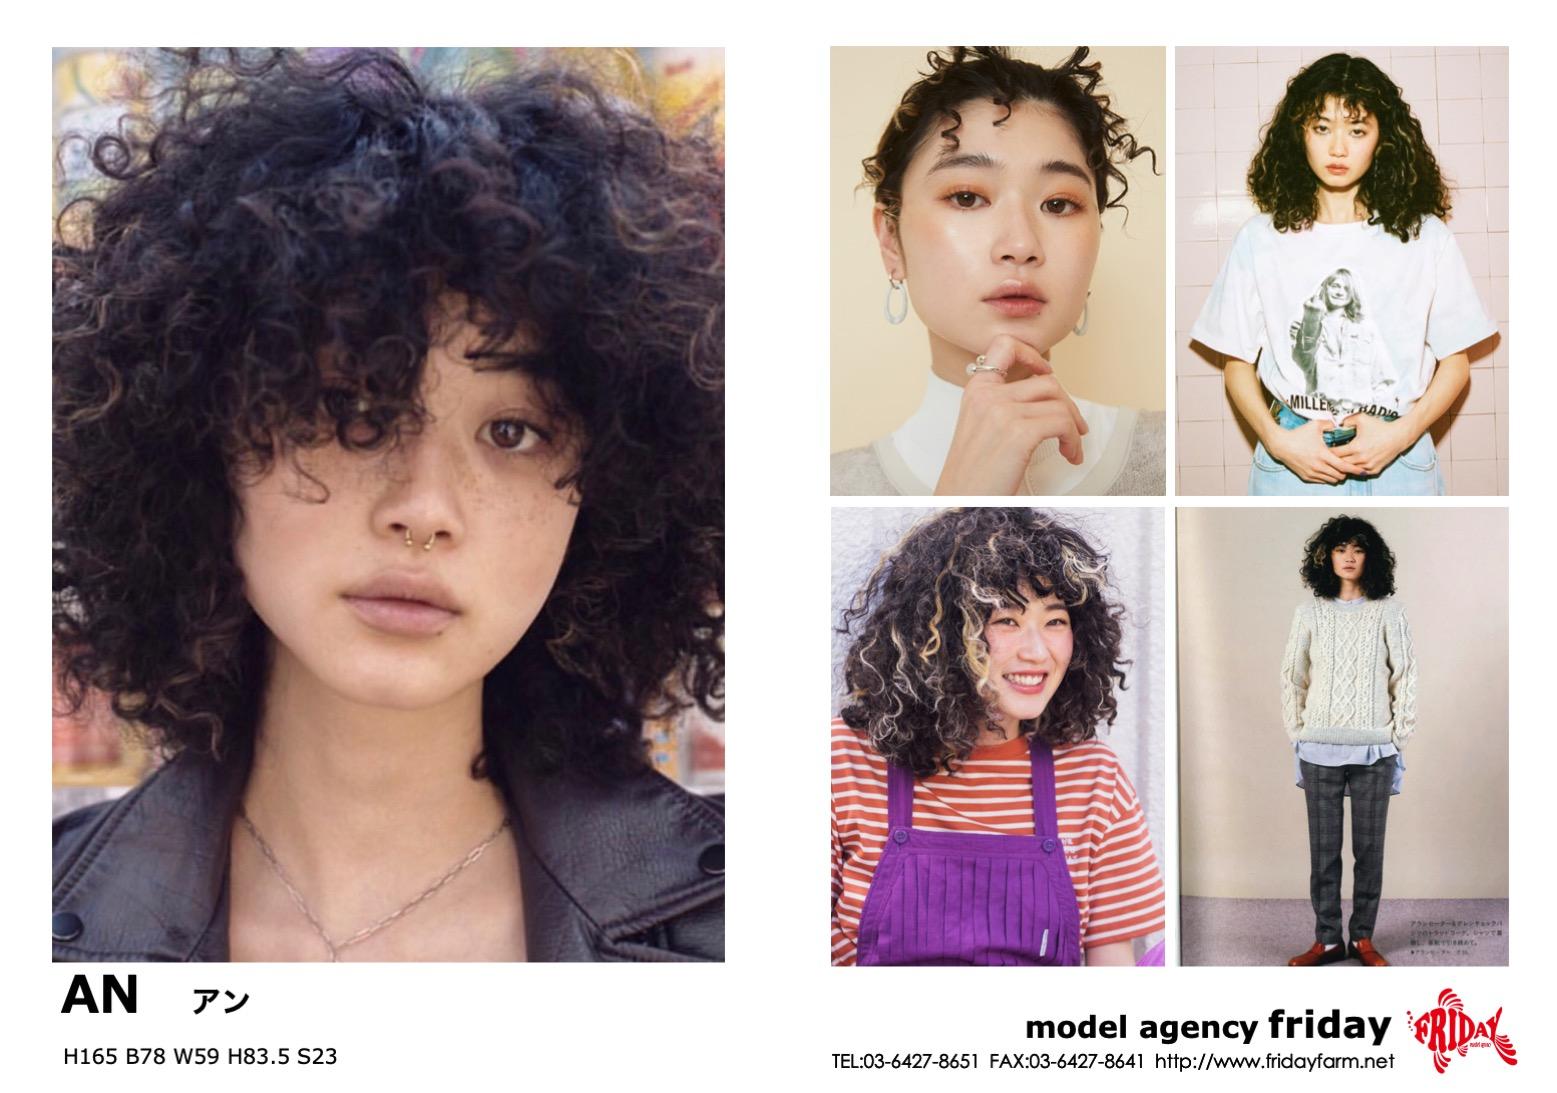 AN - アン | model agency friday